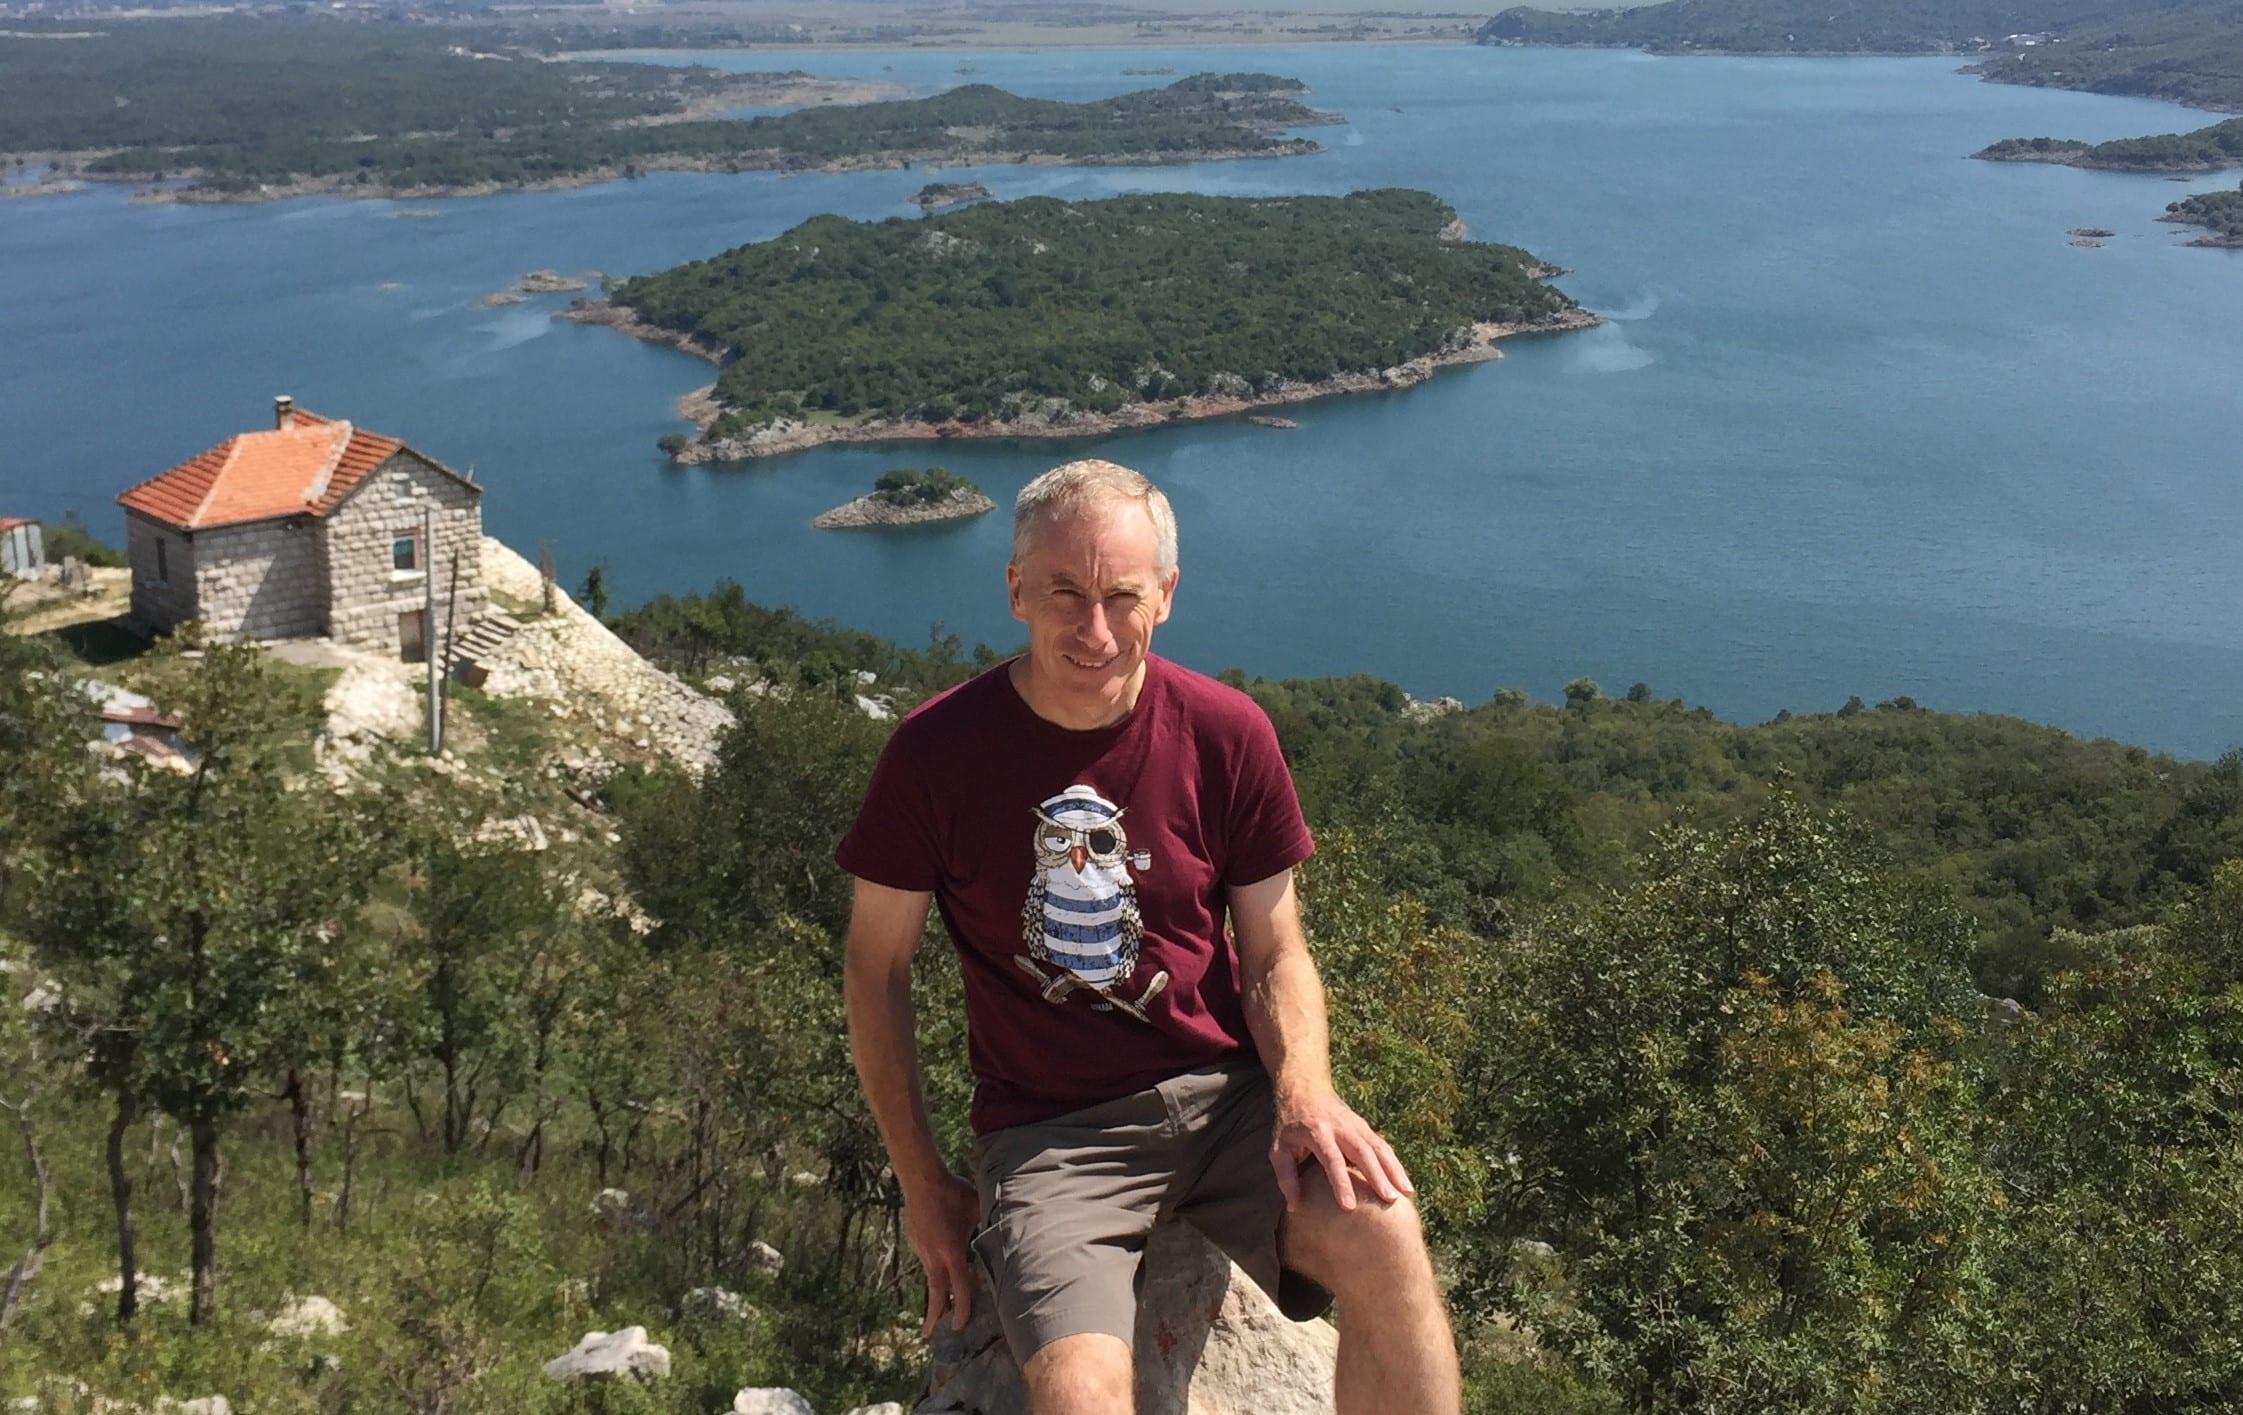 Meet our founder Simon Hooper